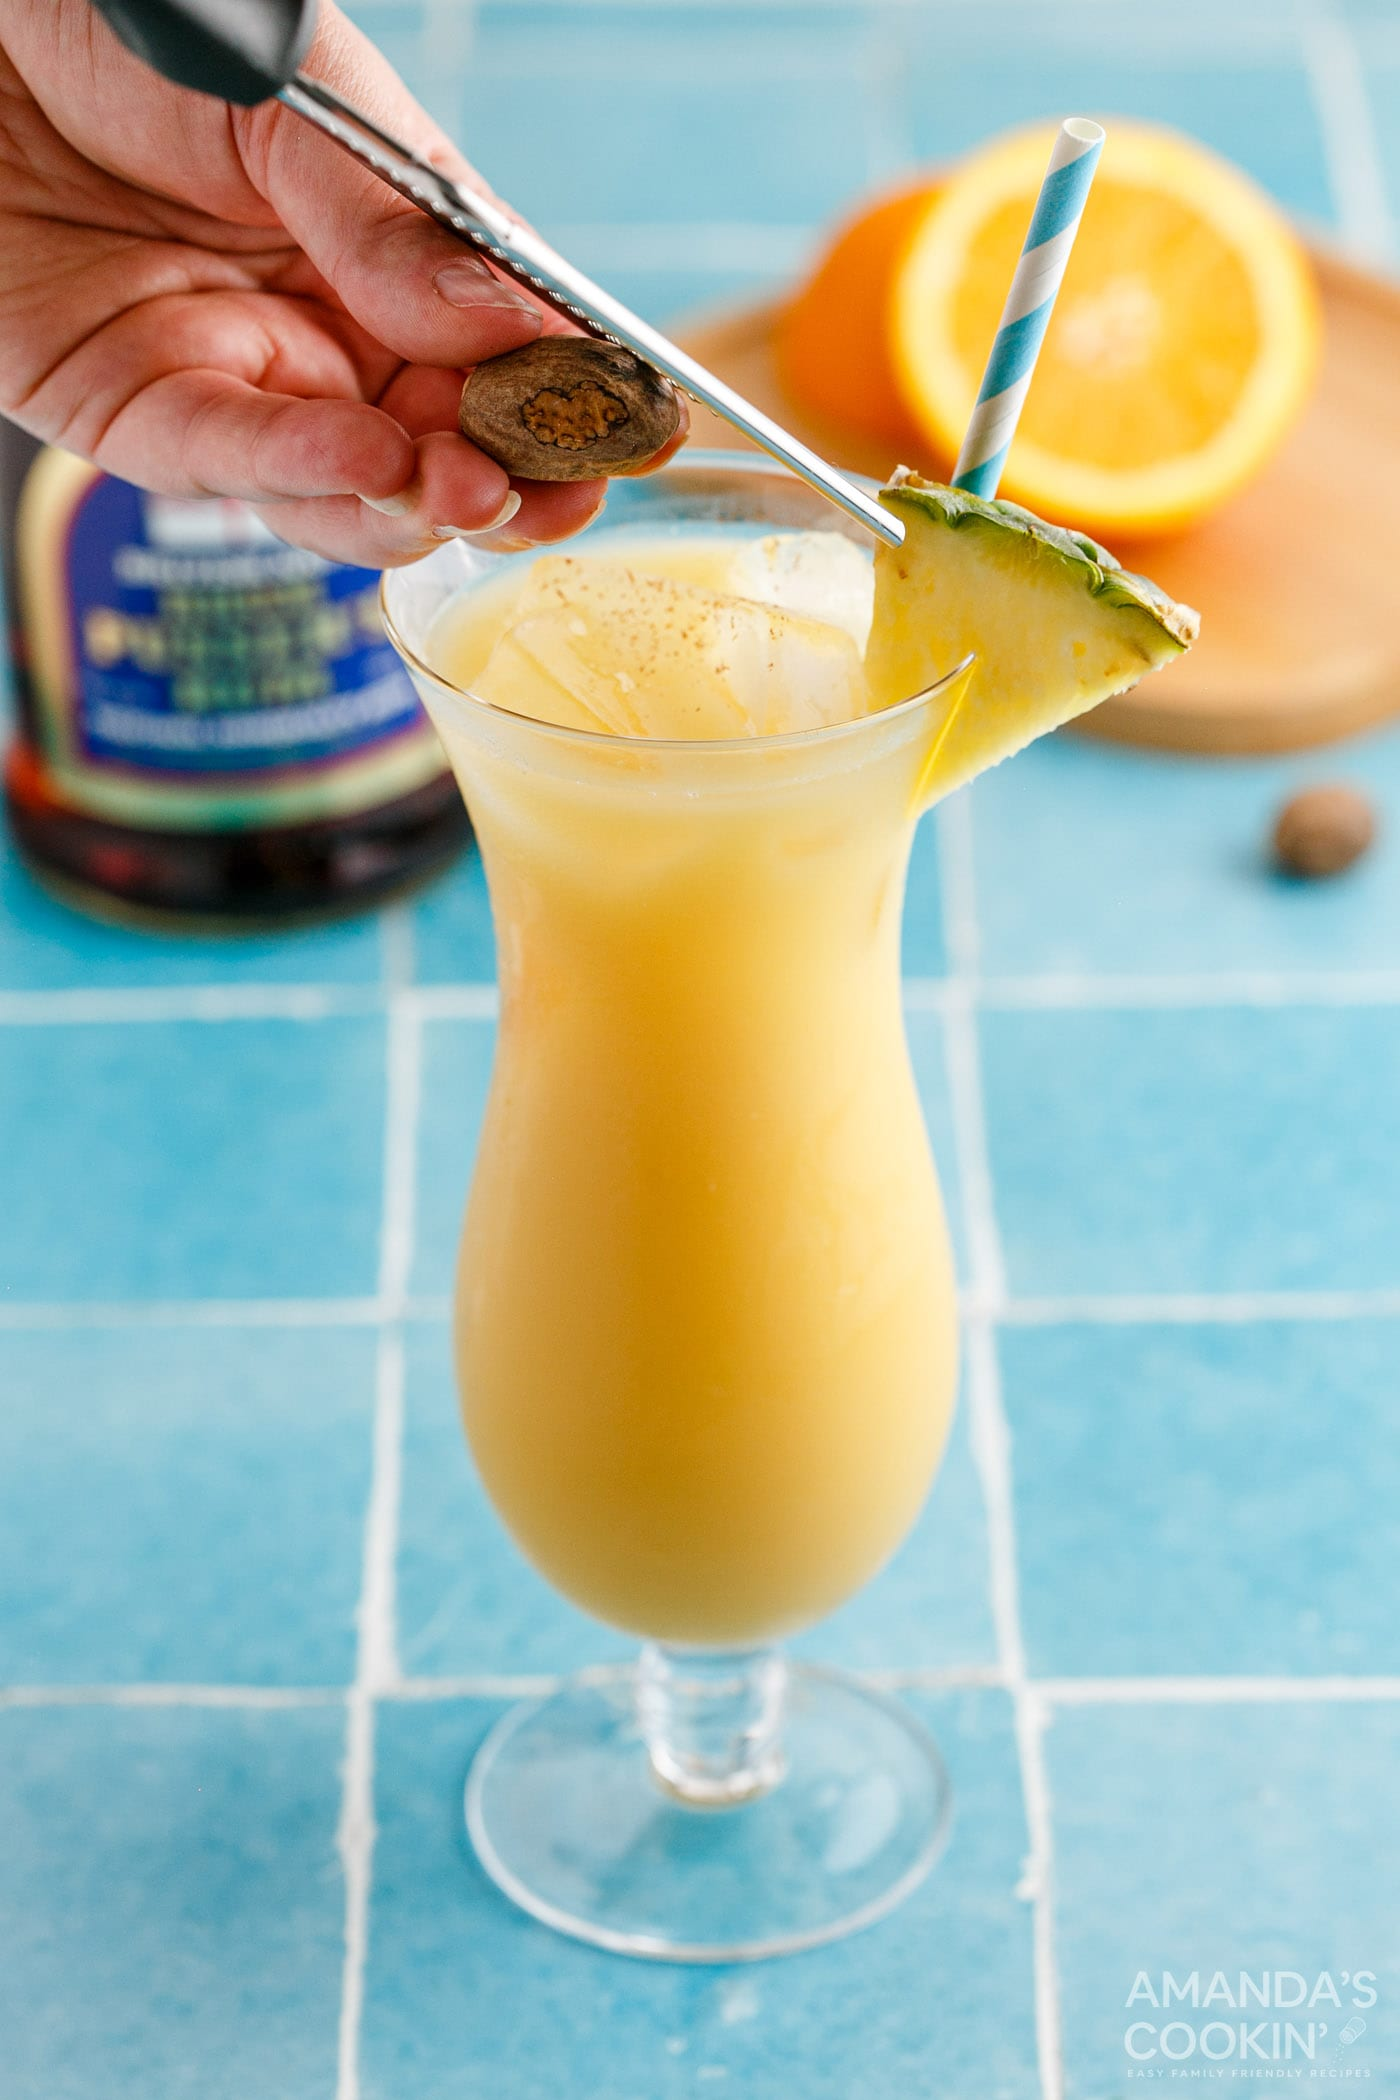 adding pineapple wedge garnish to painkiller cocktail